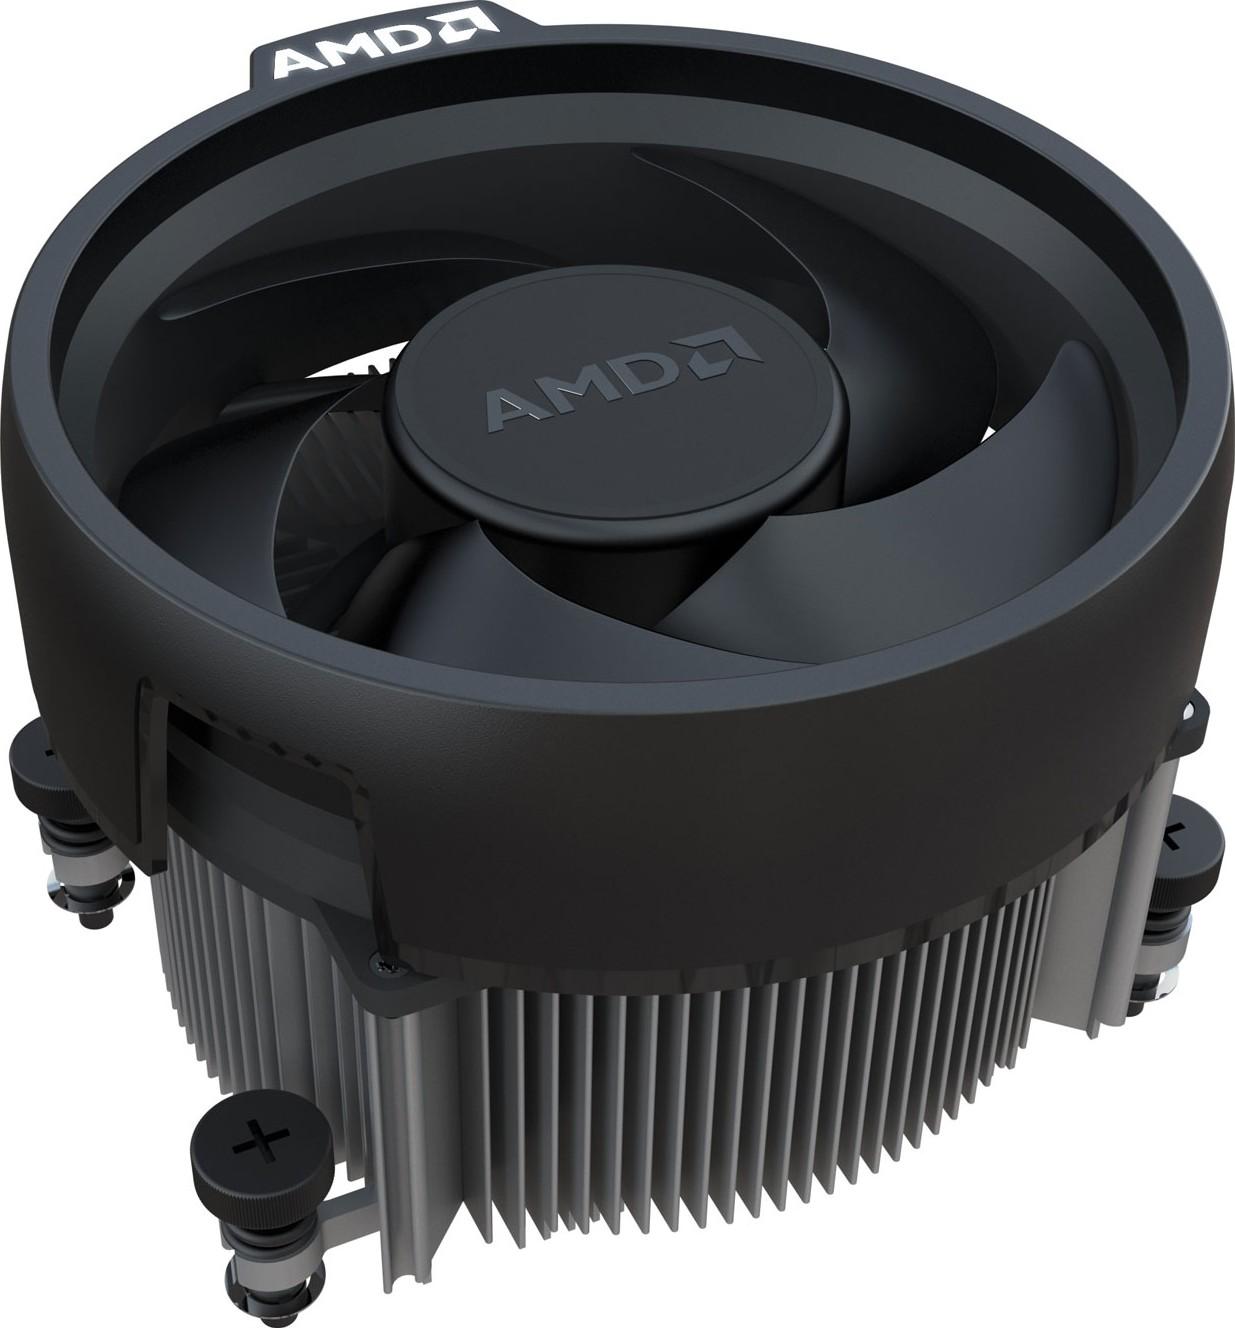 AMD Ryzen 5 3400G w RADEON RX VEGA 11 Graphics 3rd Gen, AM4, Zen+, Quad  Core, 8 Thread, 3 7GHz, 4 2